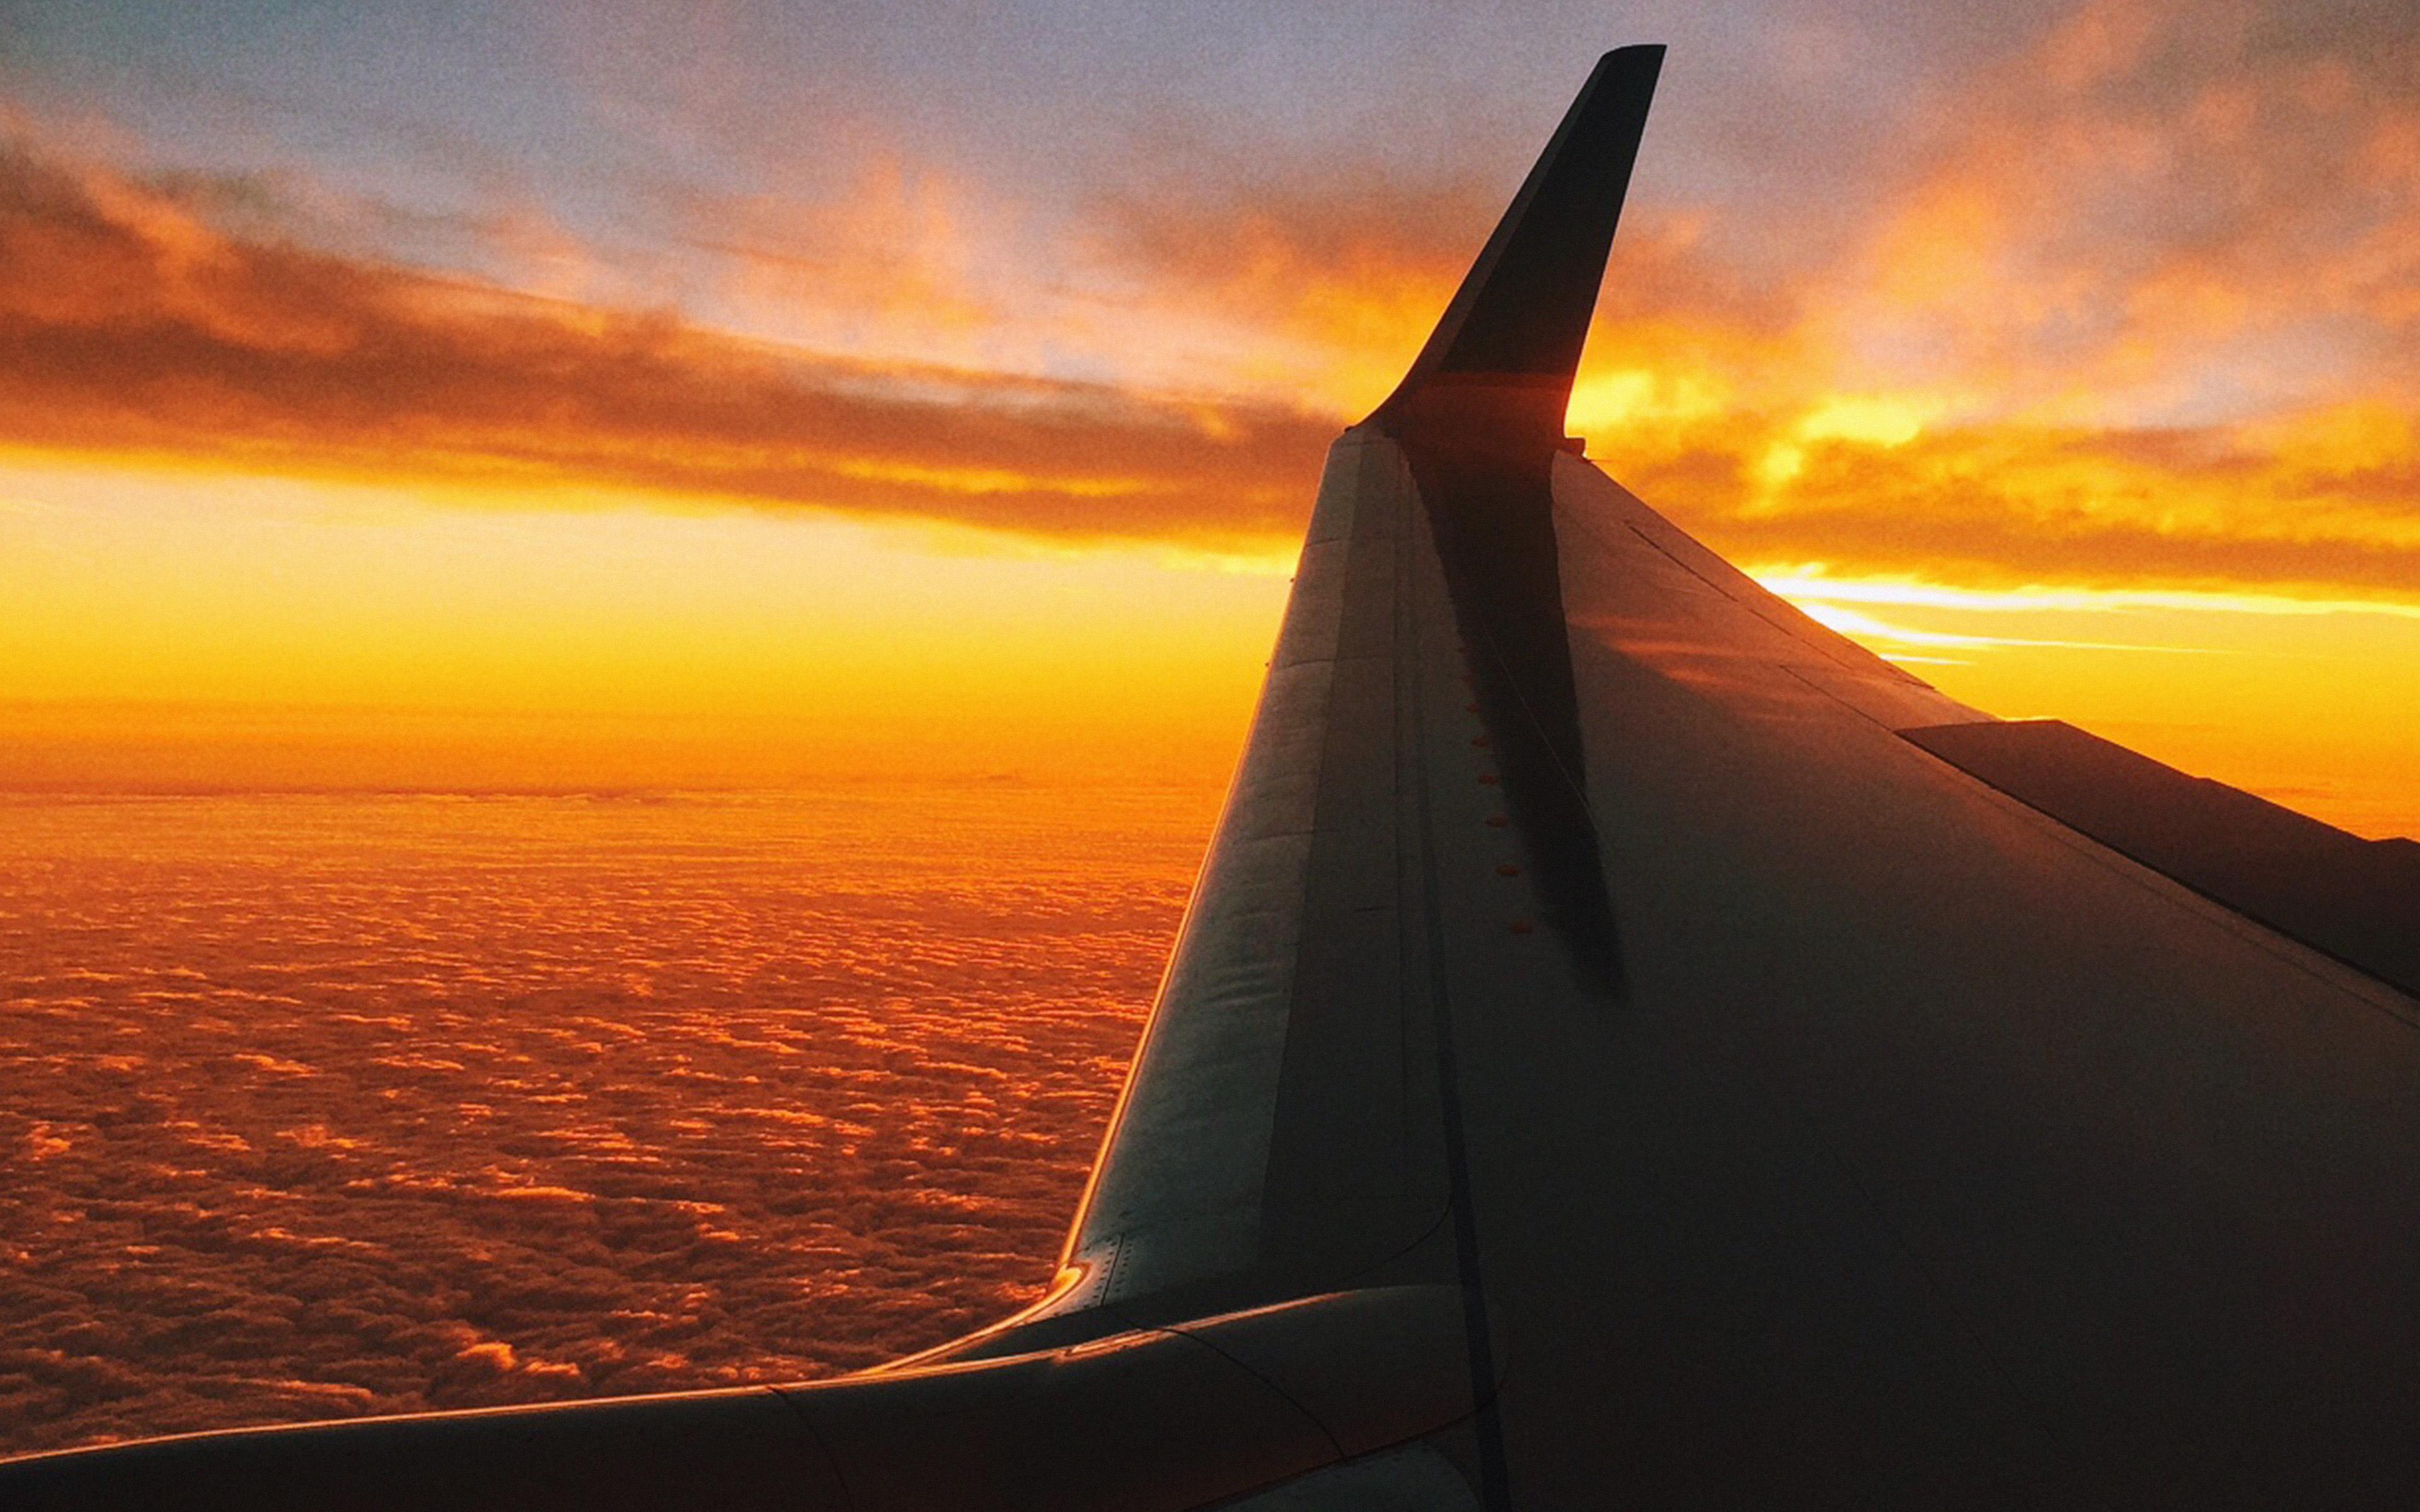 Wallpaper For Desktop Laptop Mt49 Fly Travel Sunset Red Nature Air Sky